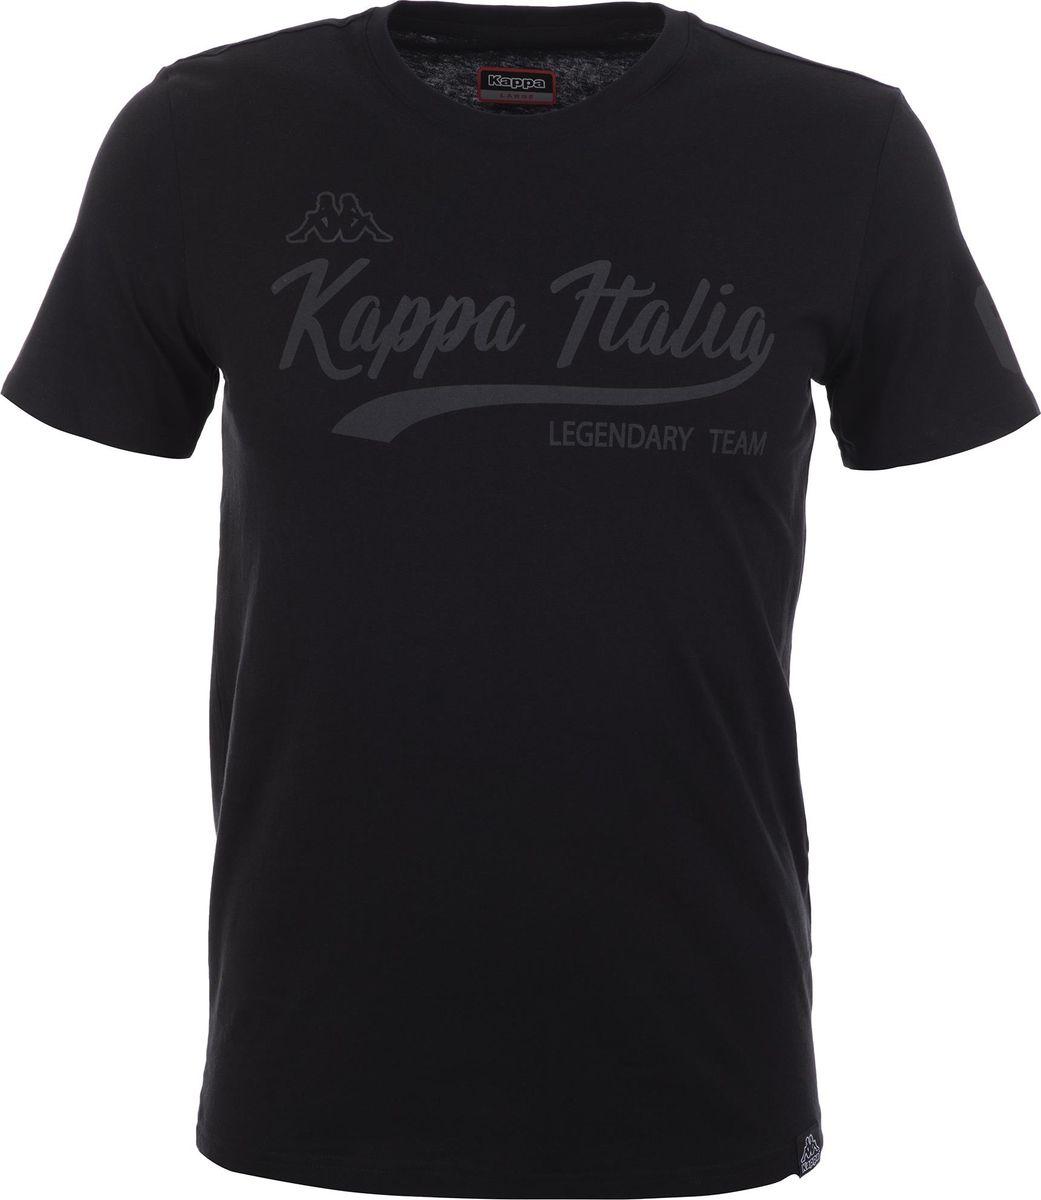 b472b1e81eb2a Футболка Kappa. Мужская футболка с коротким рукавом ...